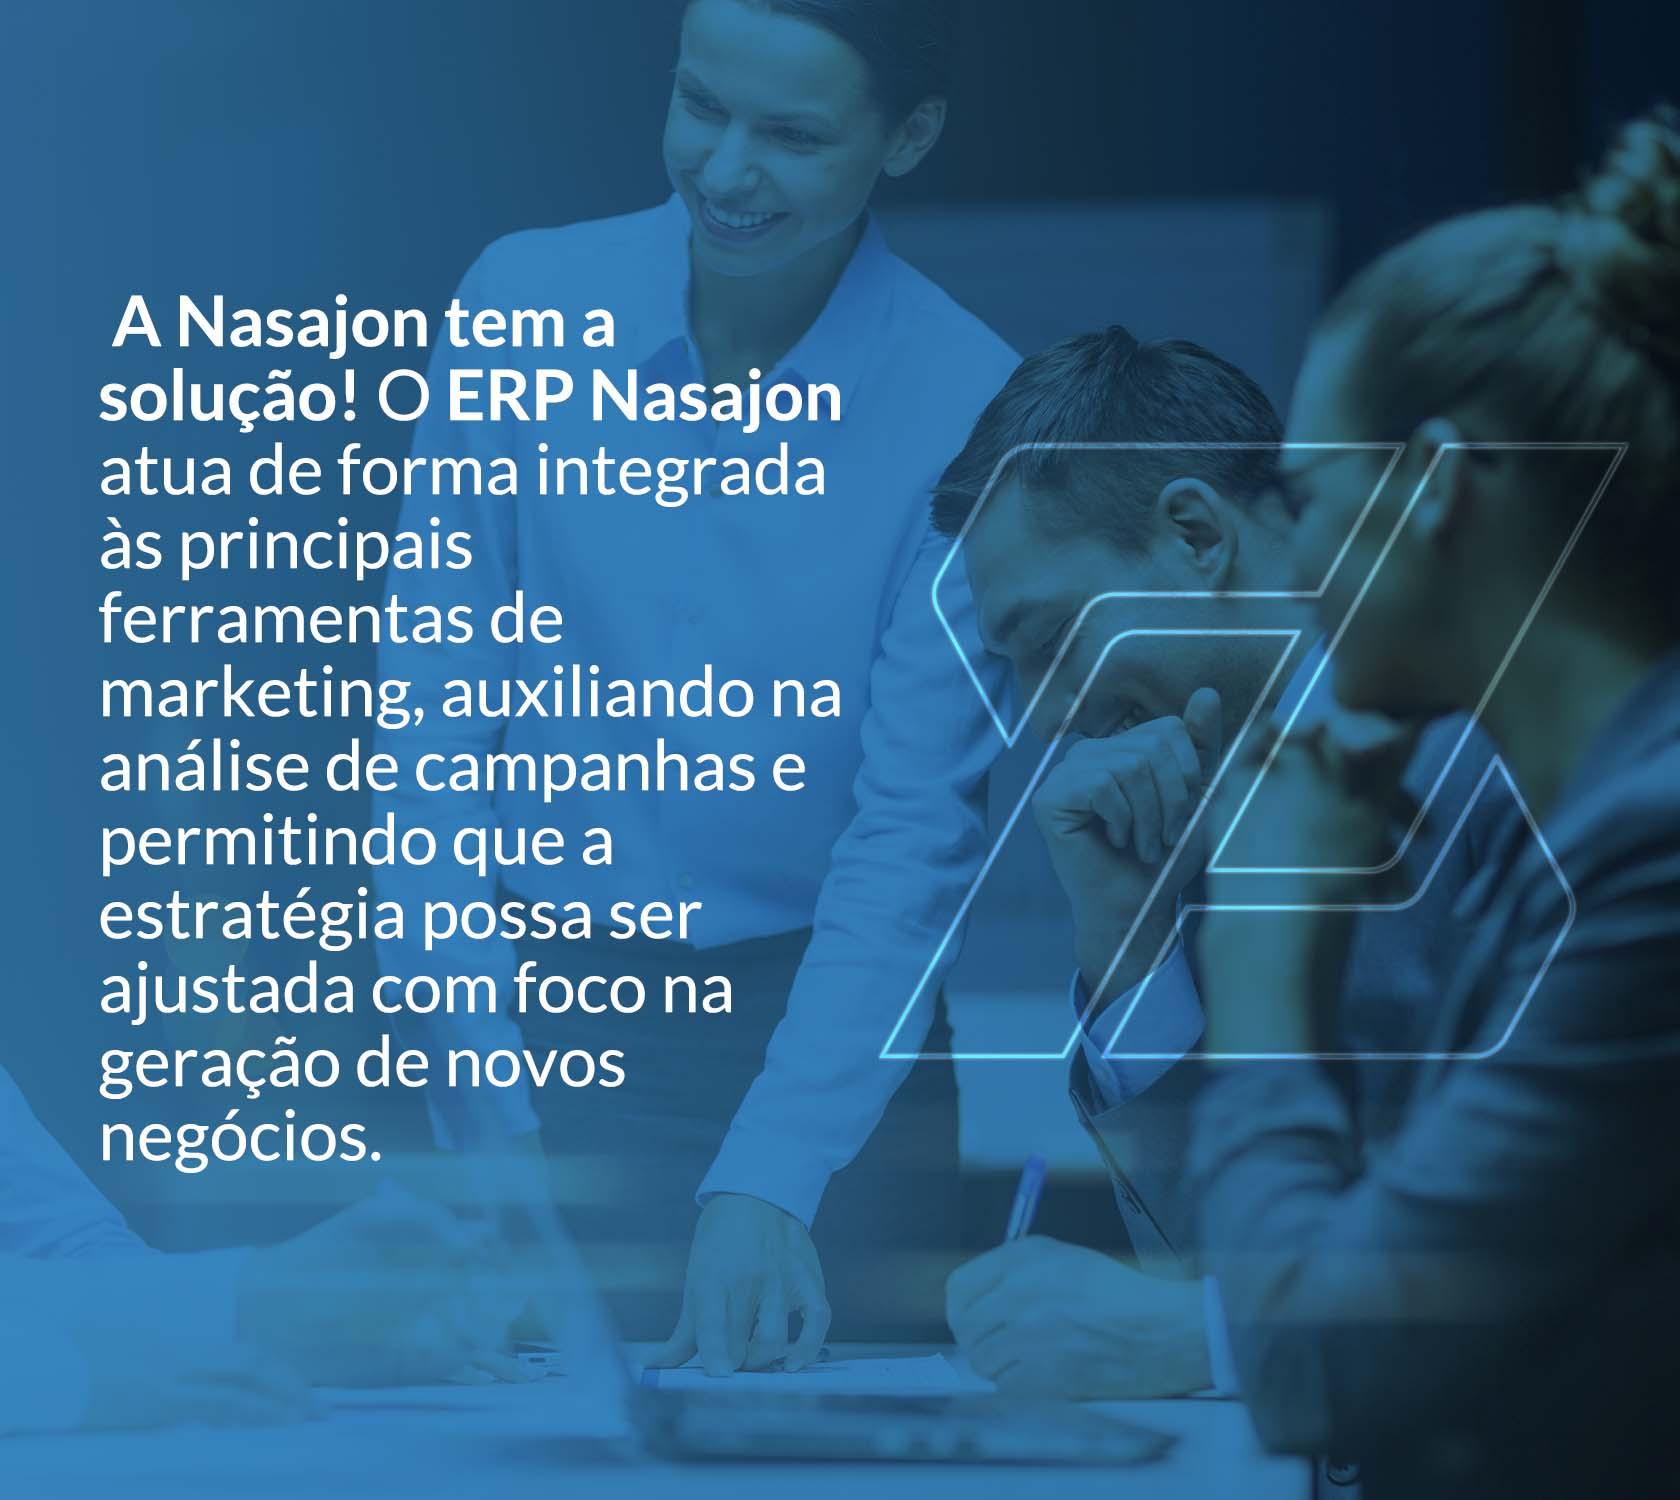 m1s_imagem_marketing1